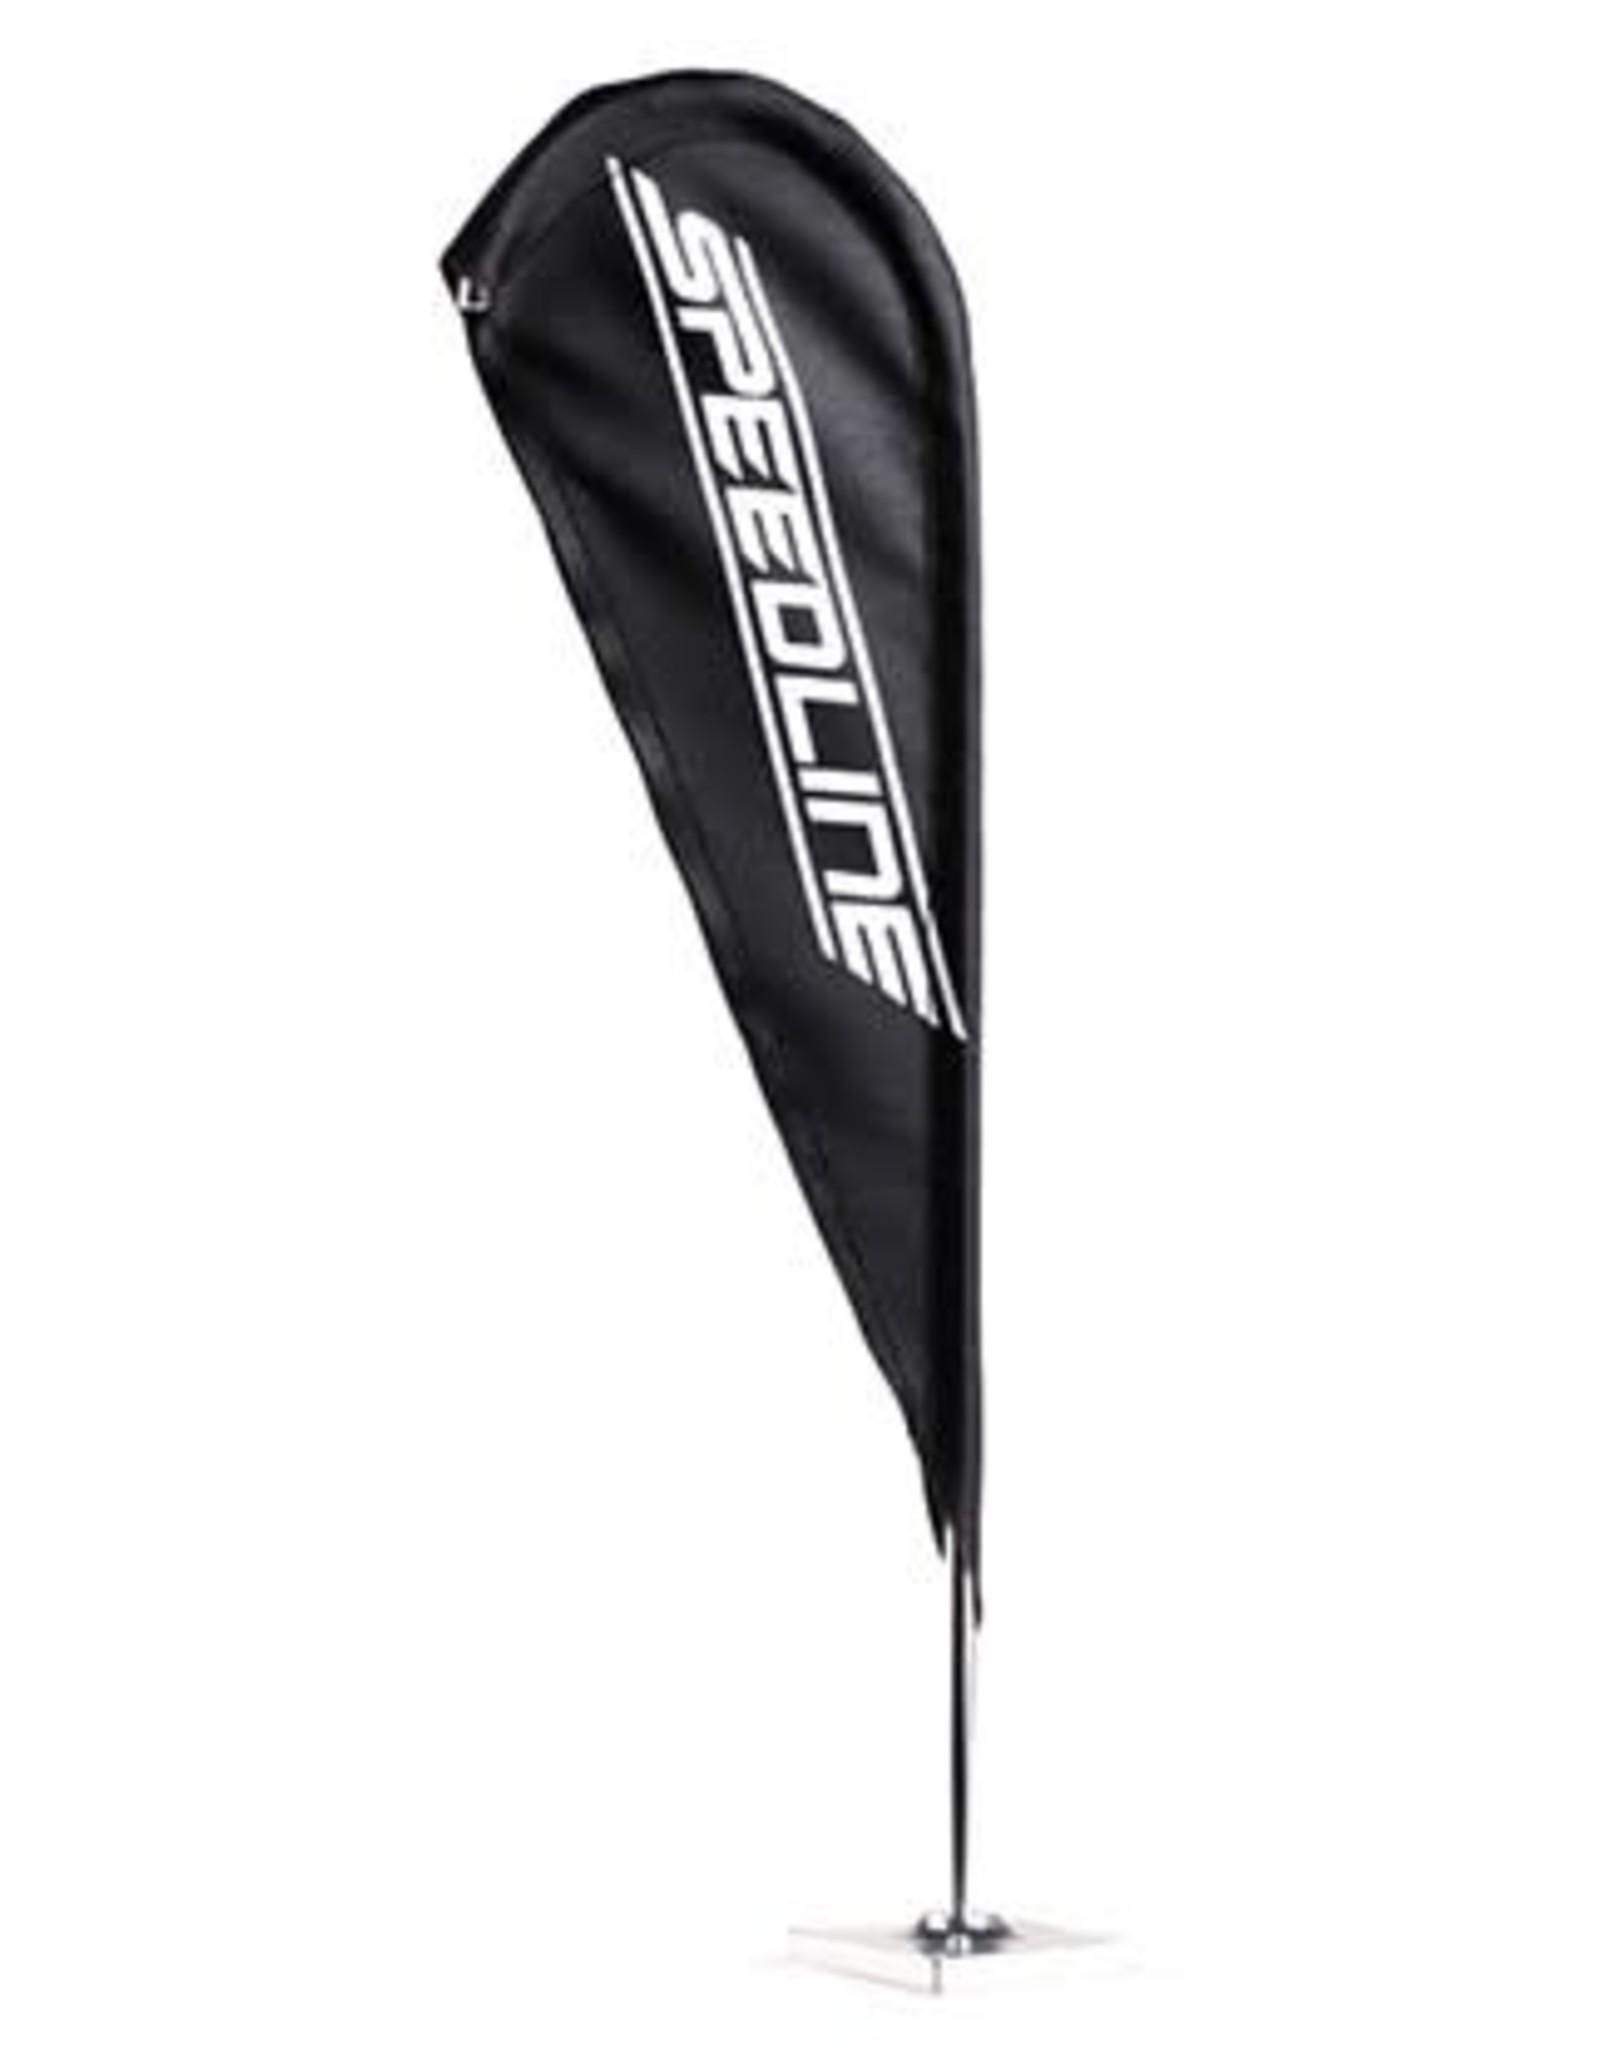 NZO N0414BL1 - Flag Speedline 24x8cm Black - NZO